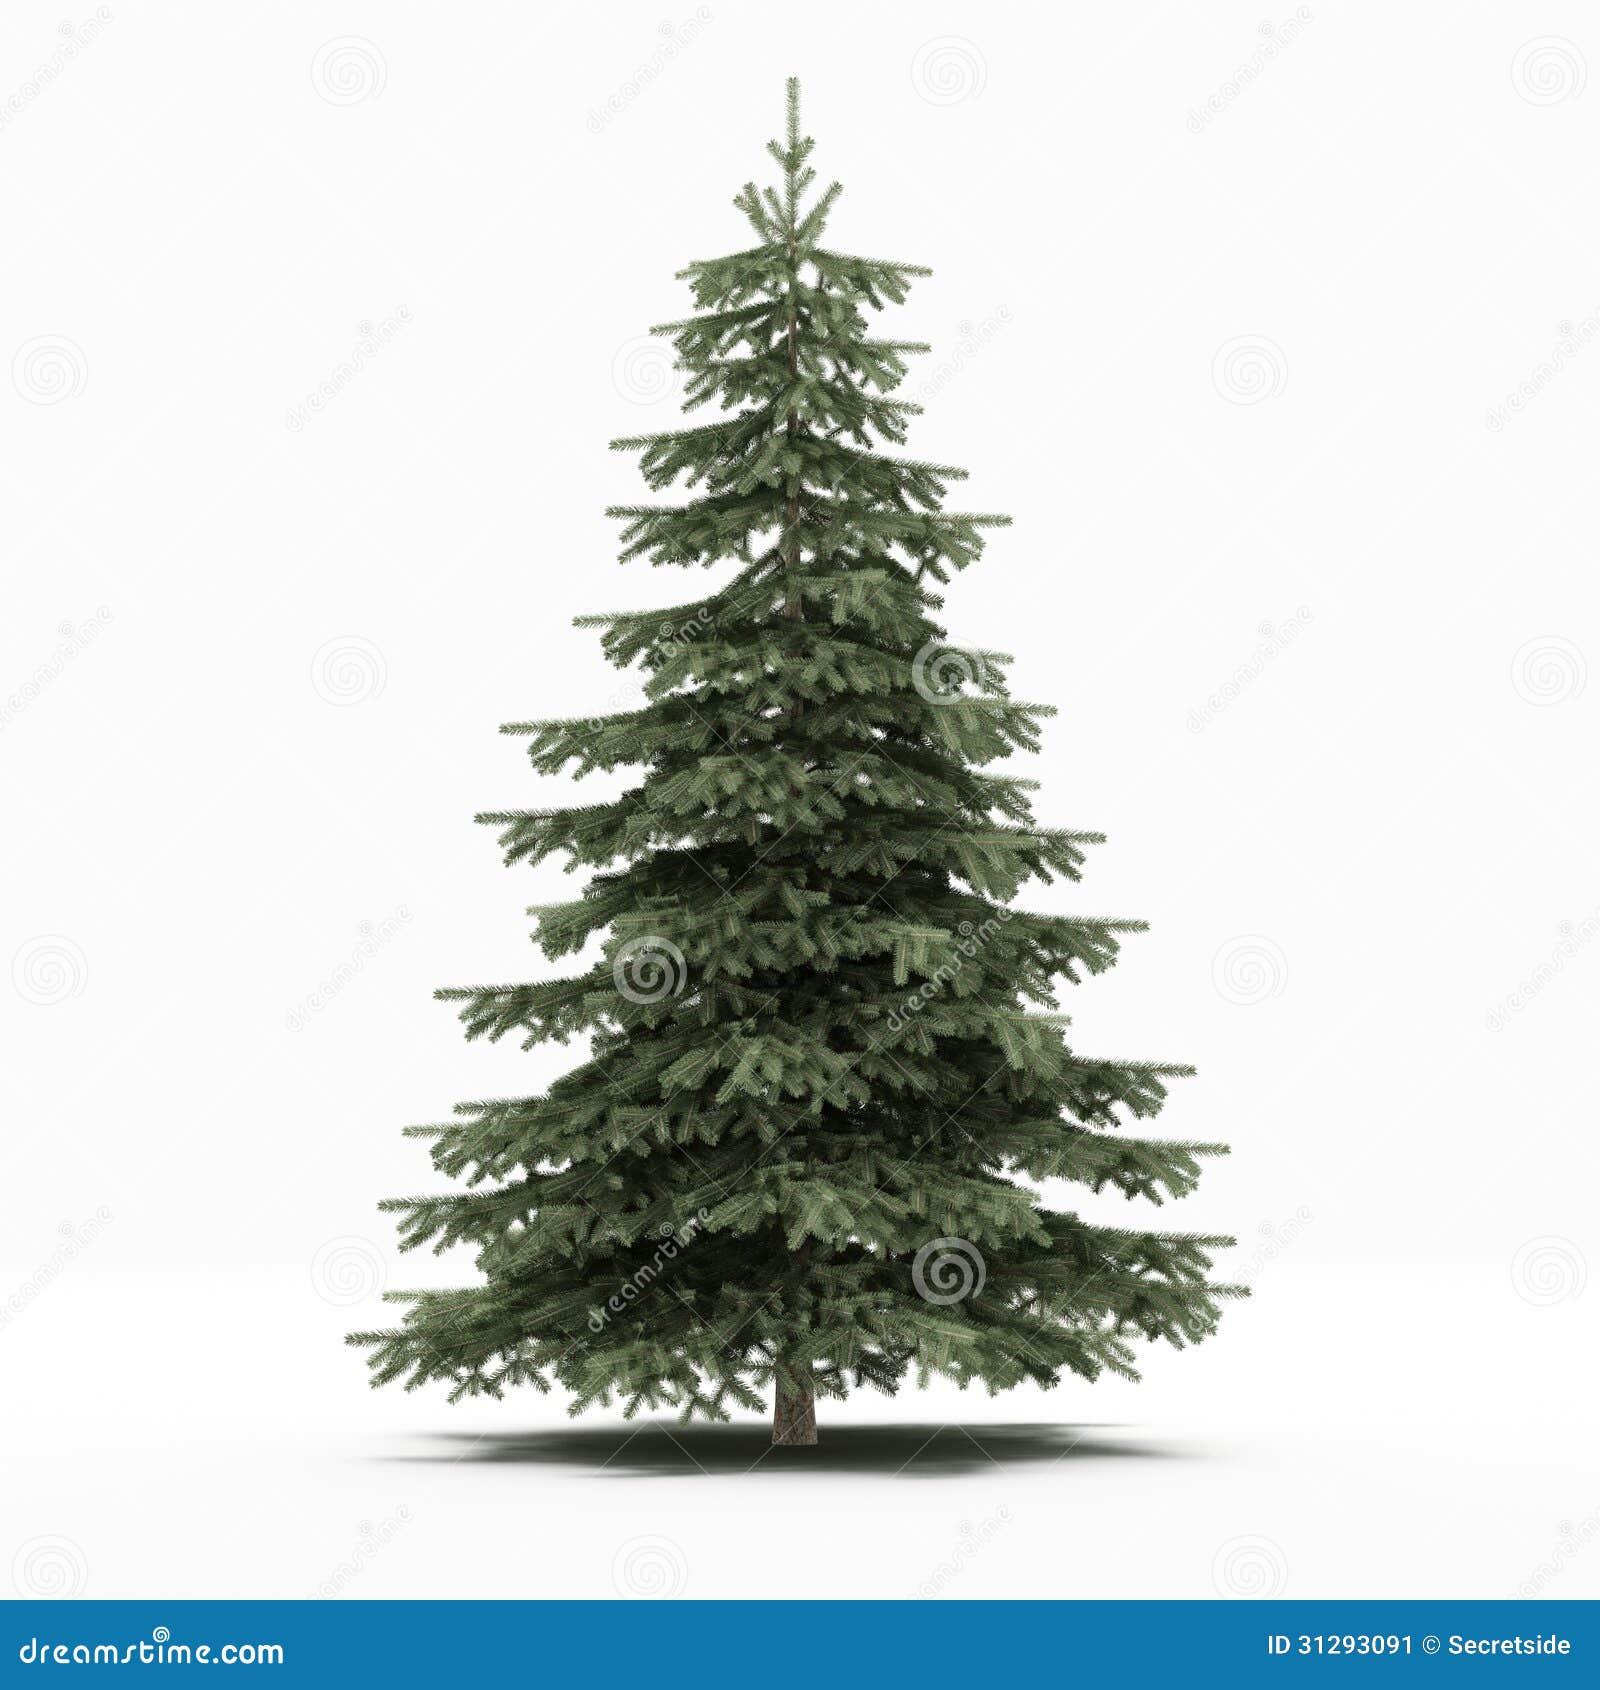 u00c1rbol de pino stock de ilustraci u00f3n ilustraci u00f3n de pine tree vector free pine tree vector free